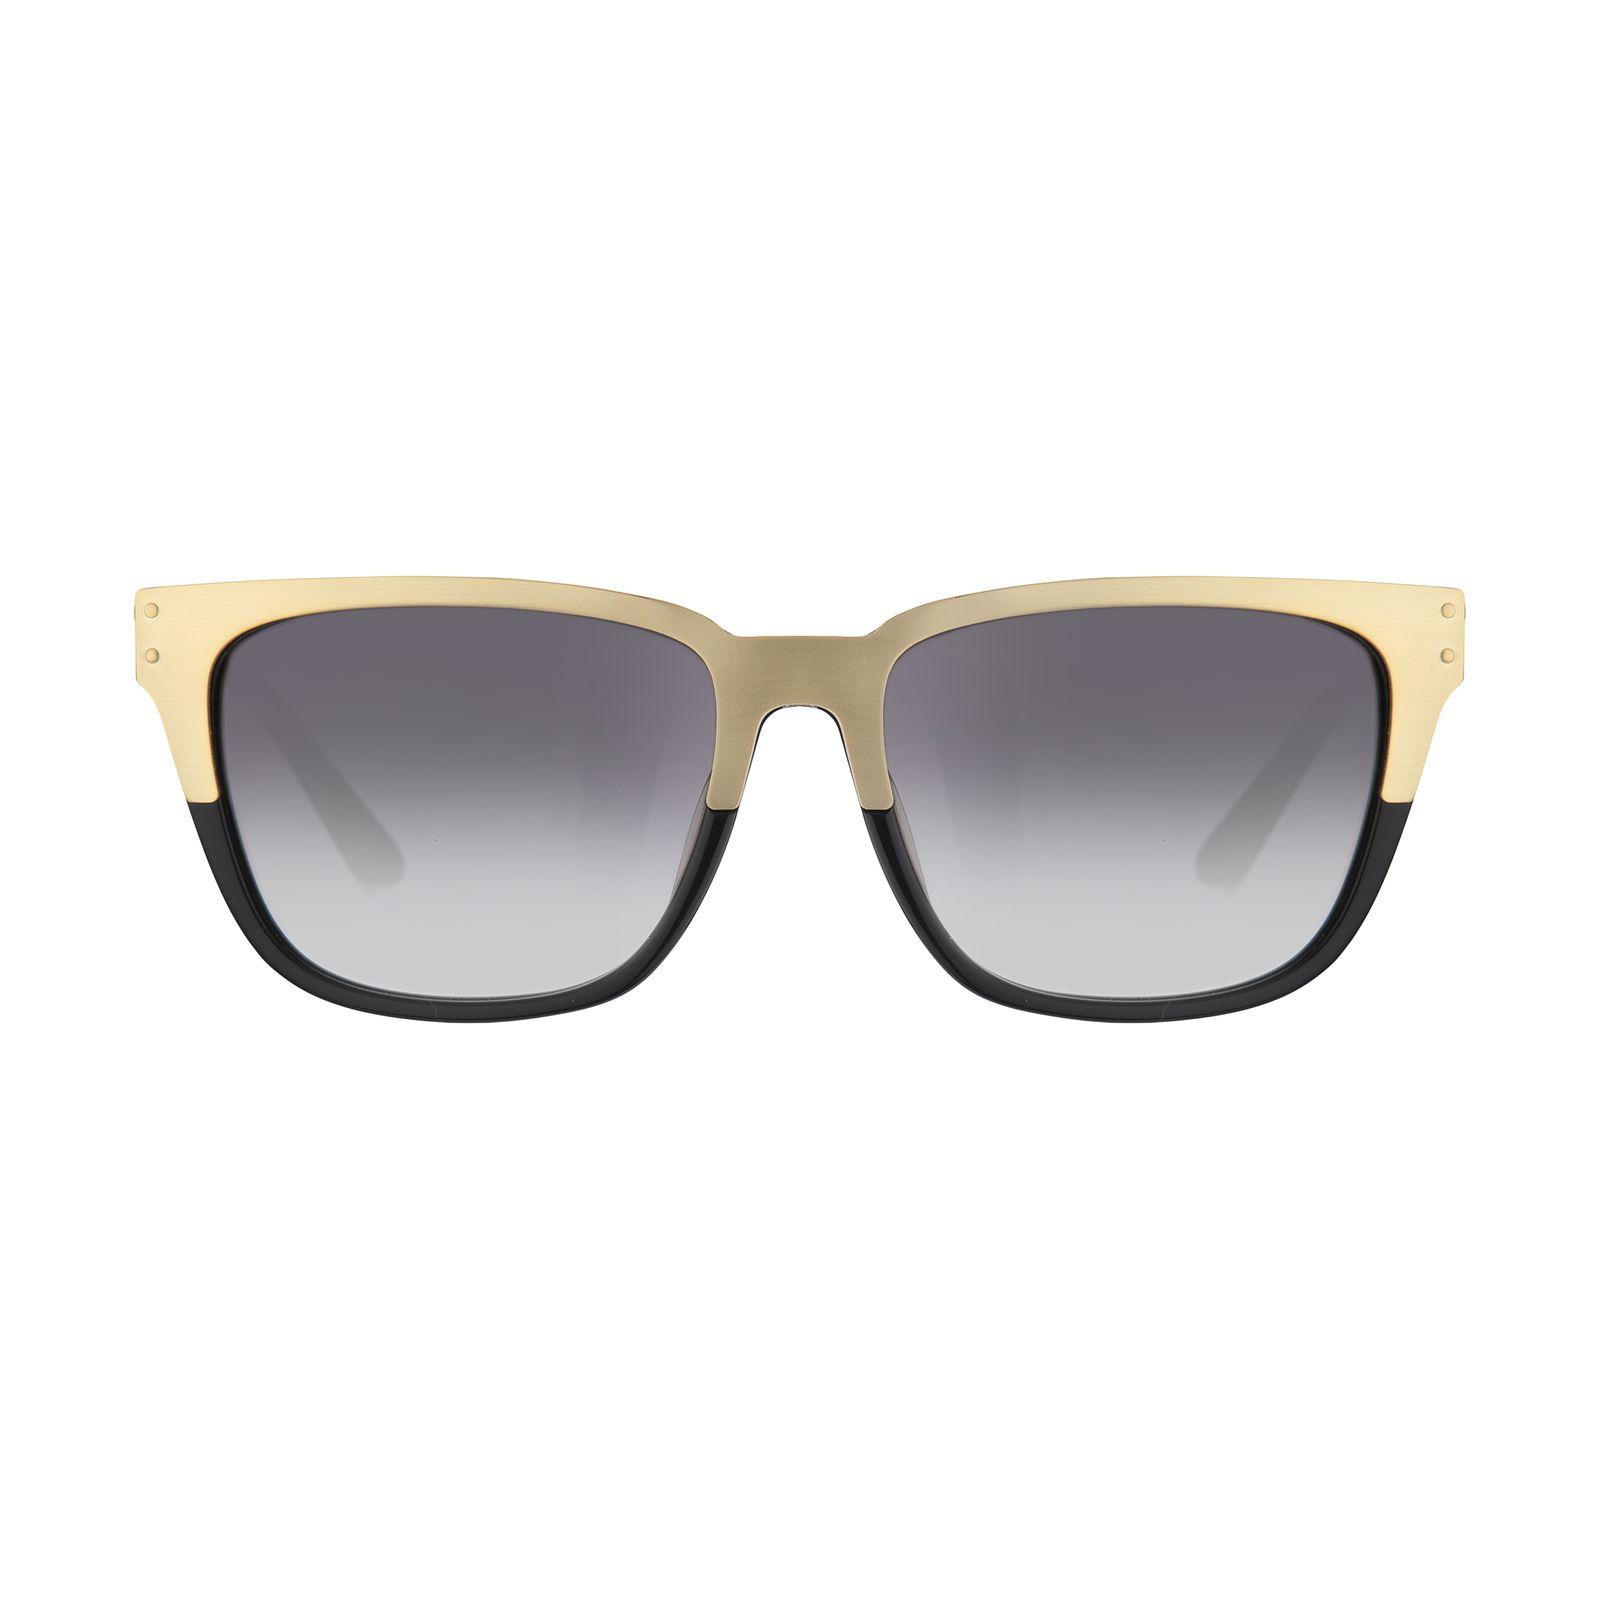 عینک آفتابی کلویی مدل 2149 -  - 2